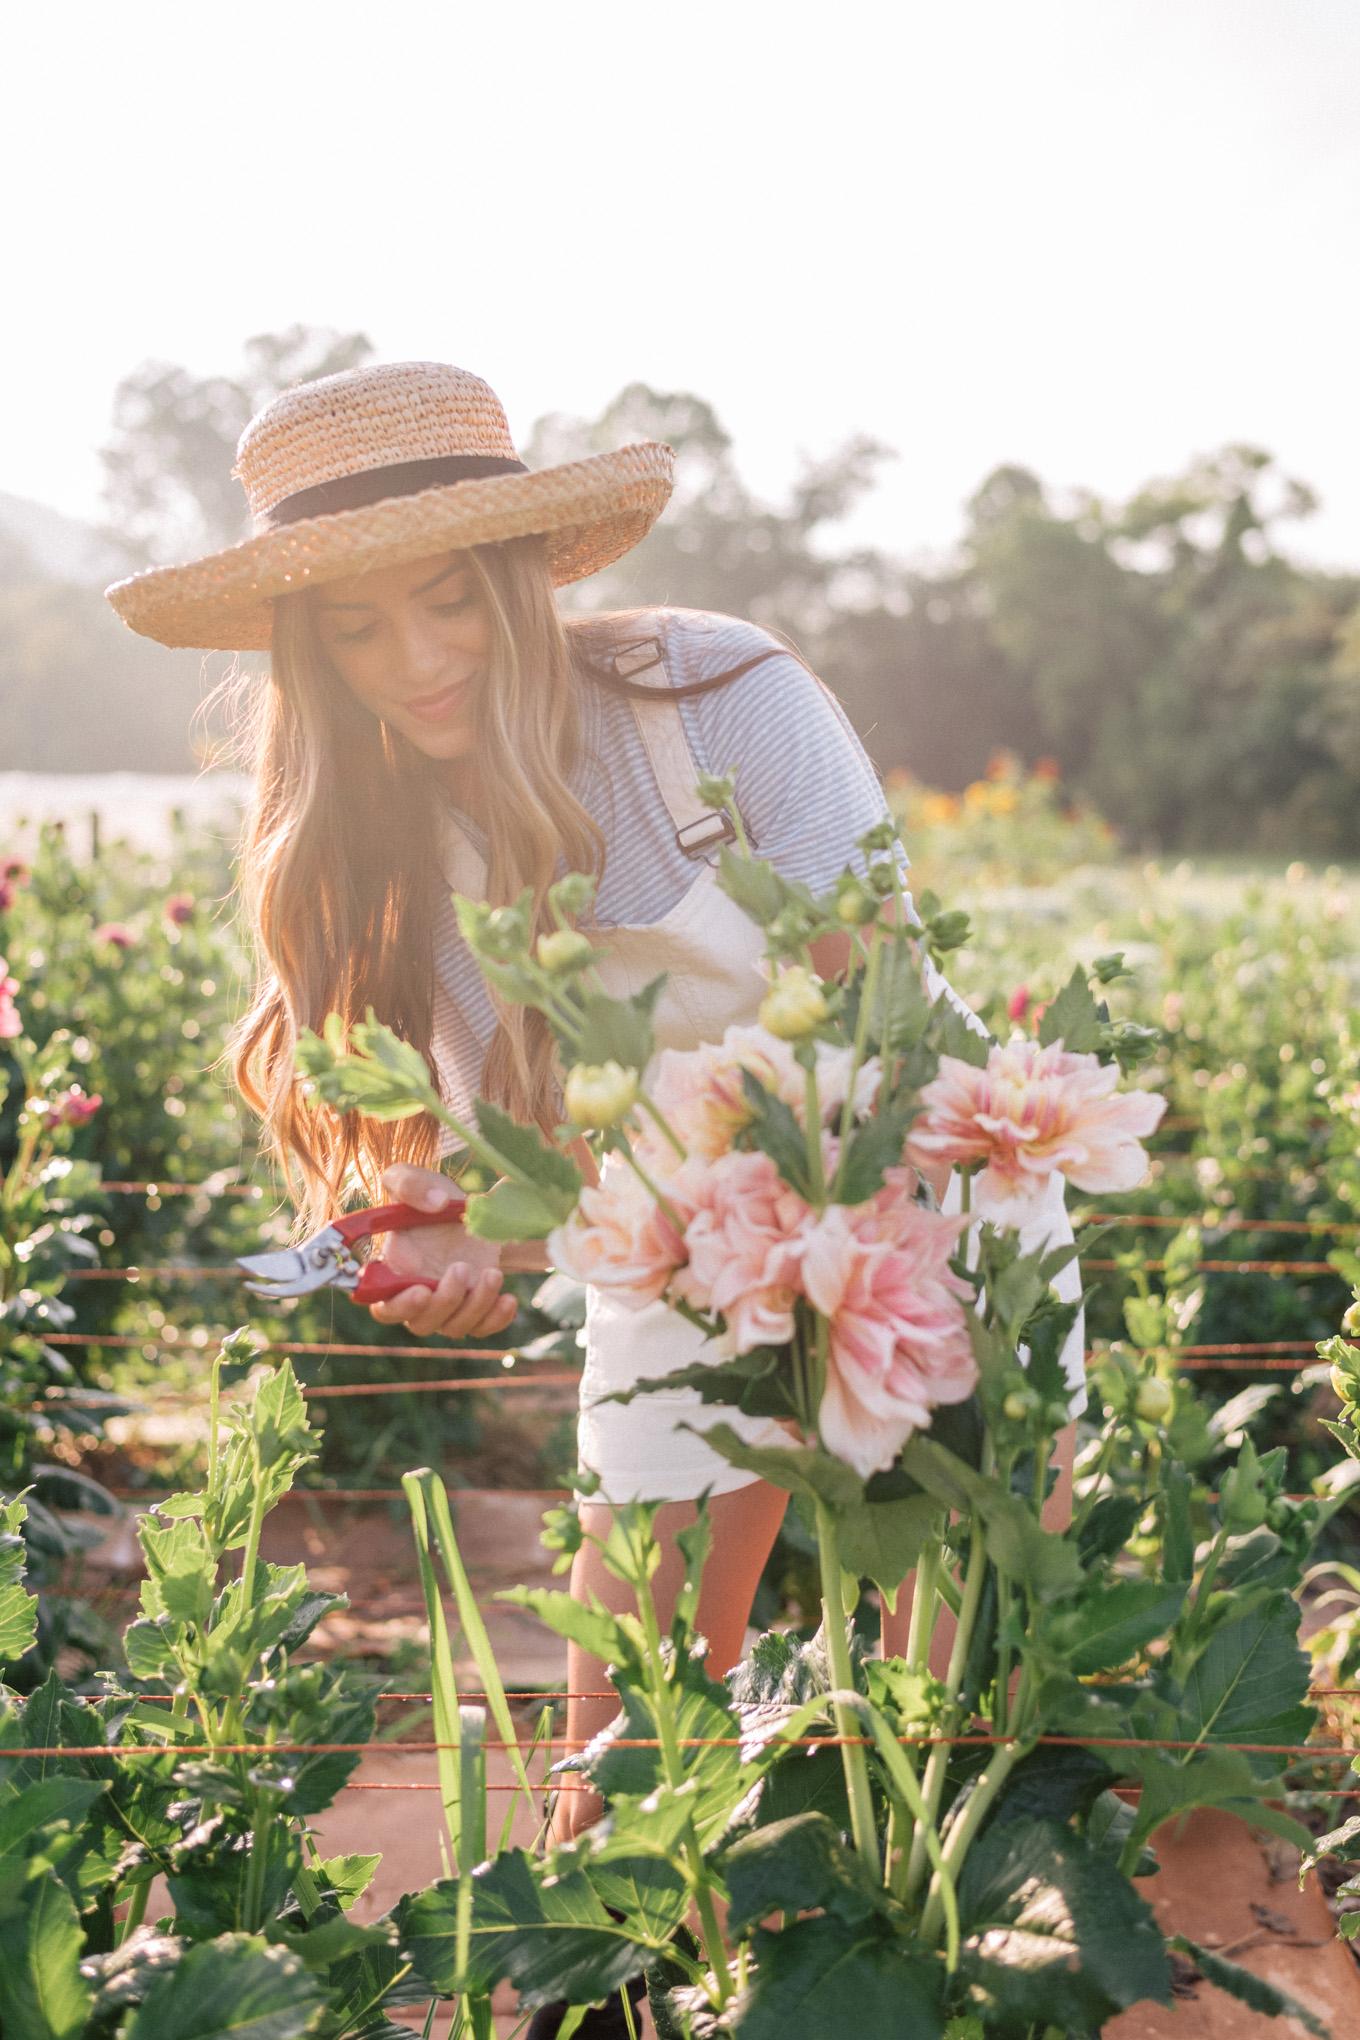 gmg-flourish-flower-farm-asheville-nc-1002934